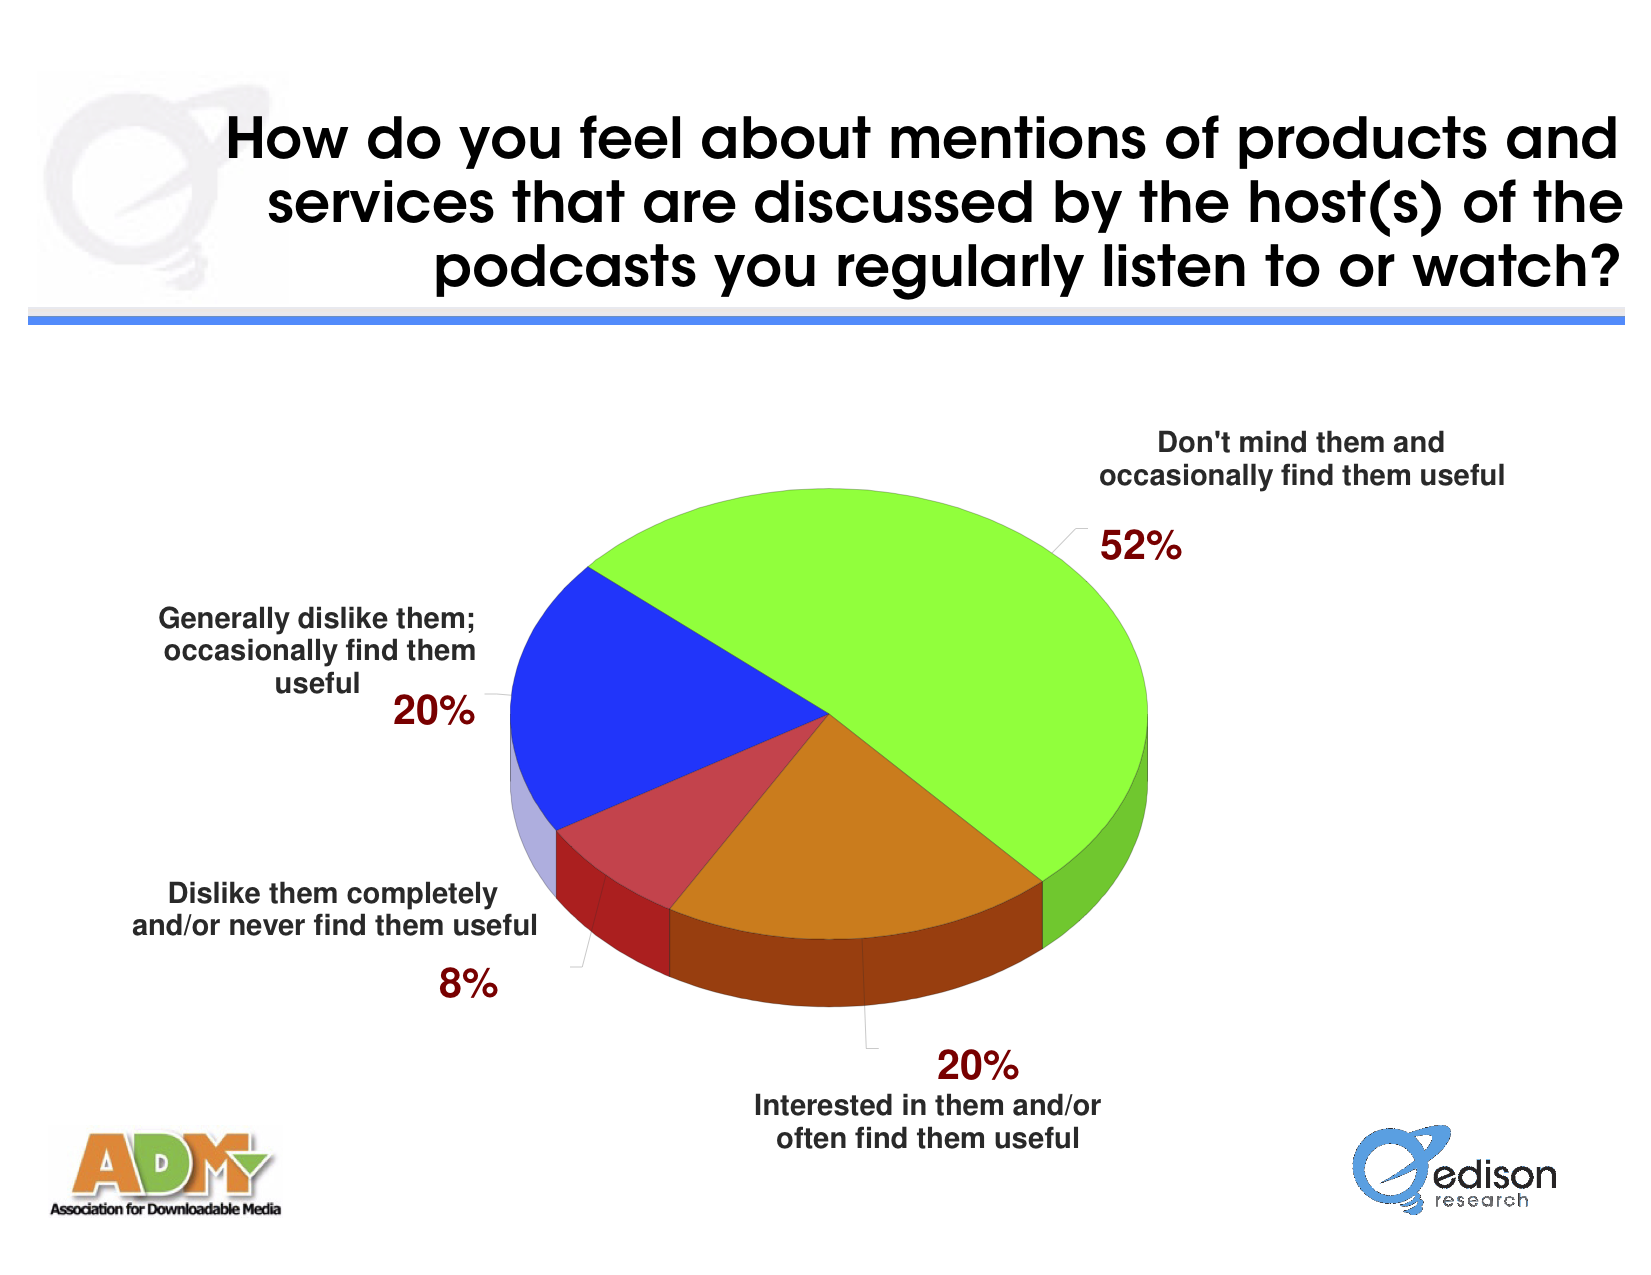 ADM - Werbung in Podcasts